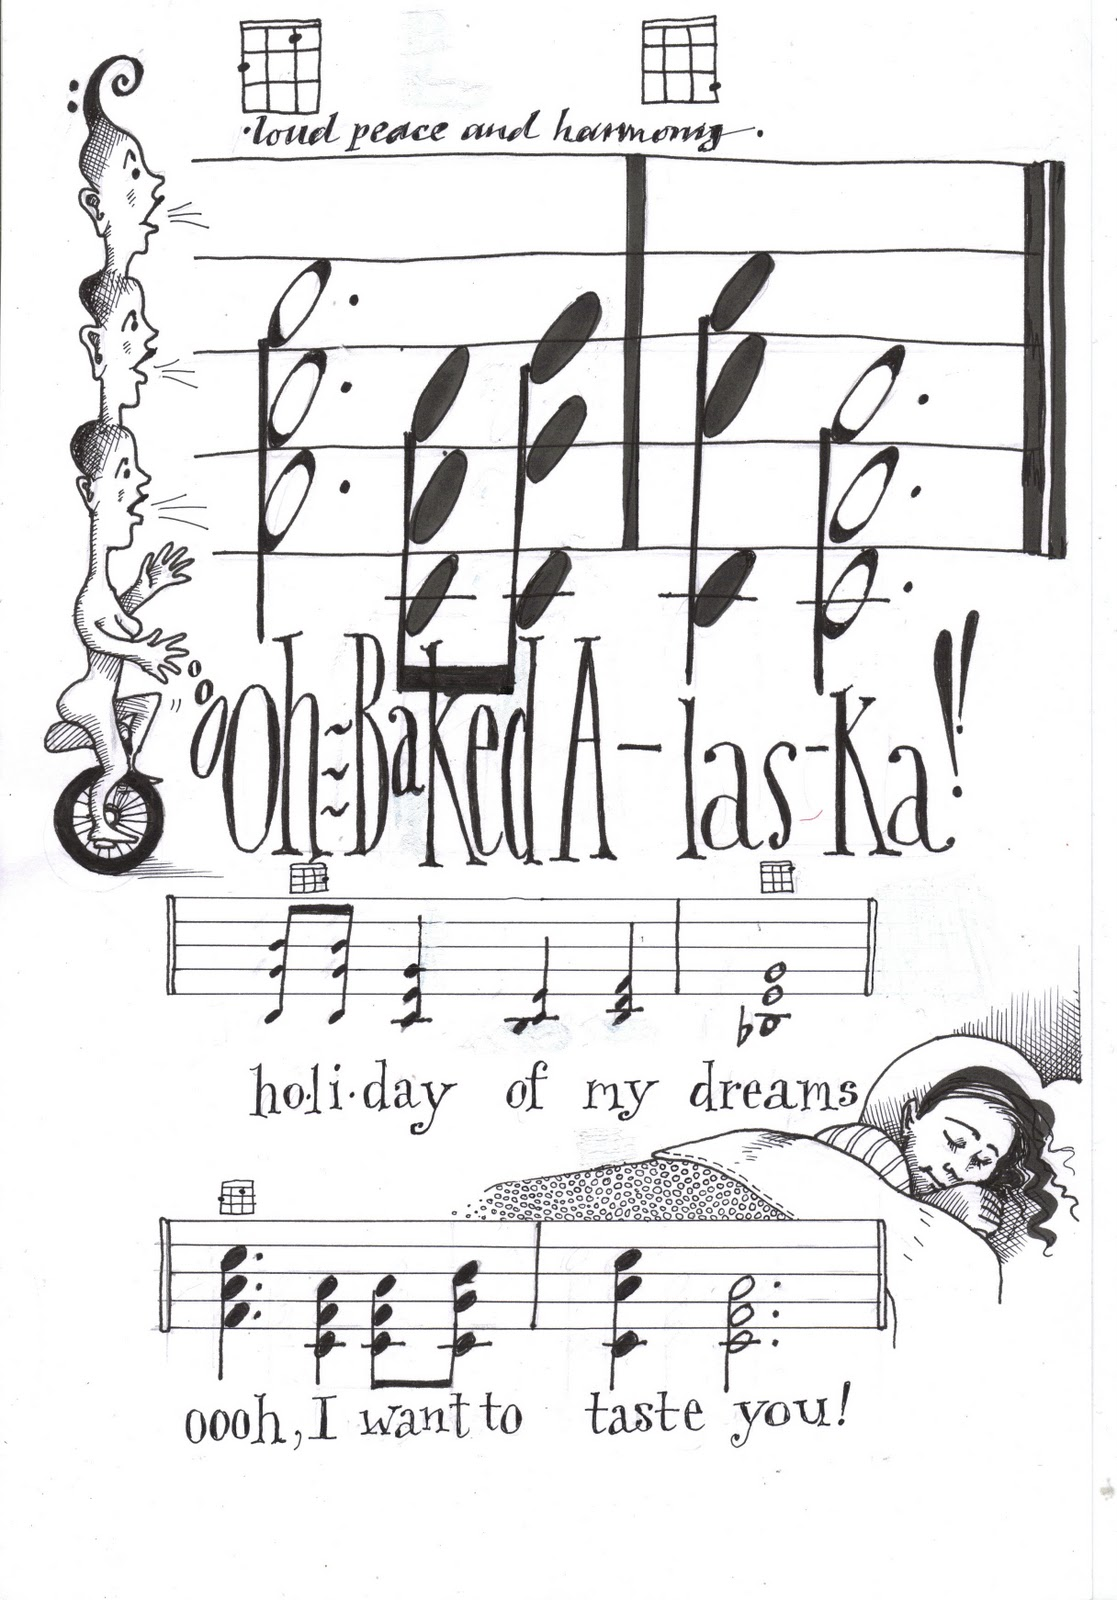 Helen McCookerybook: Baked Alaska Sheet Music and Ukelele Chords